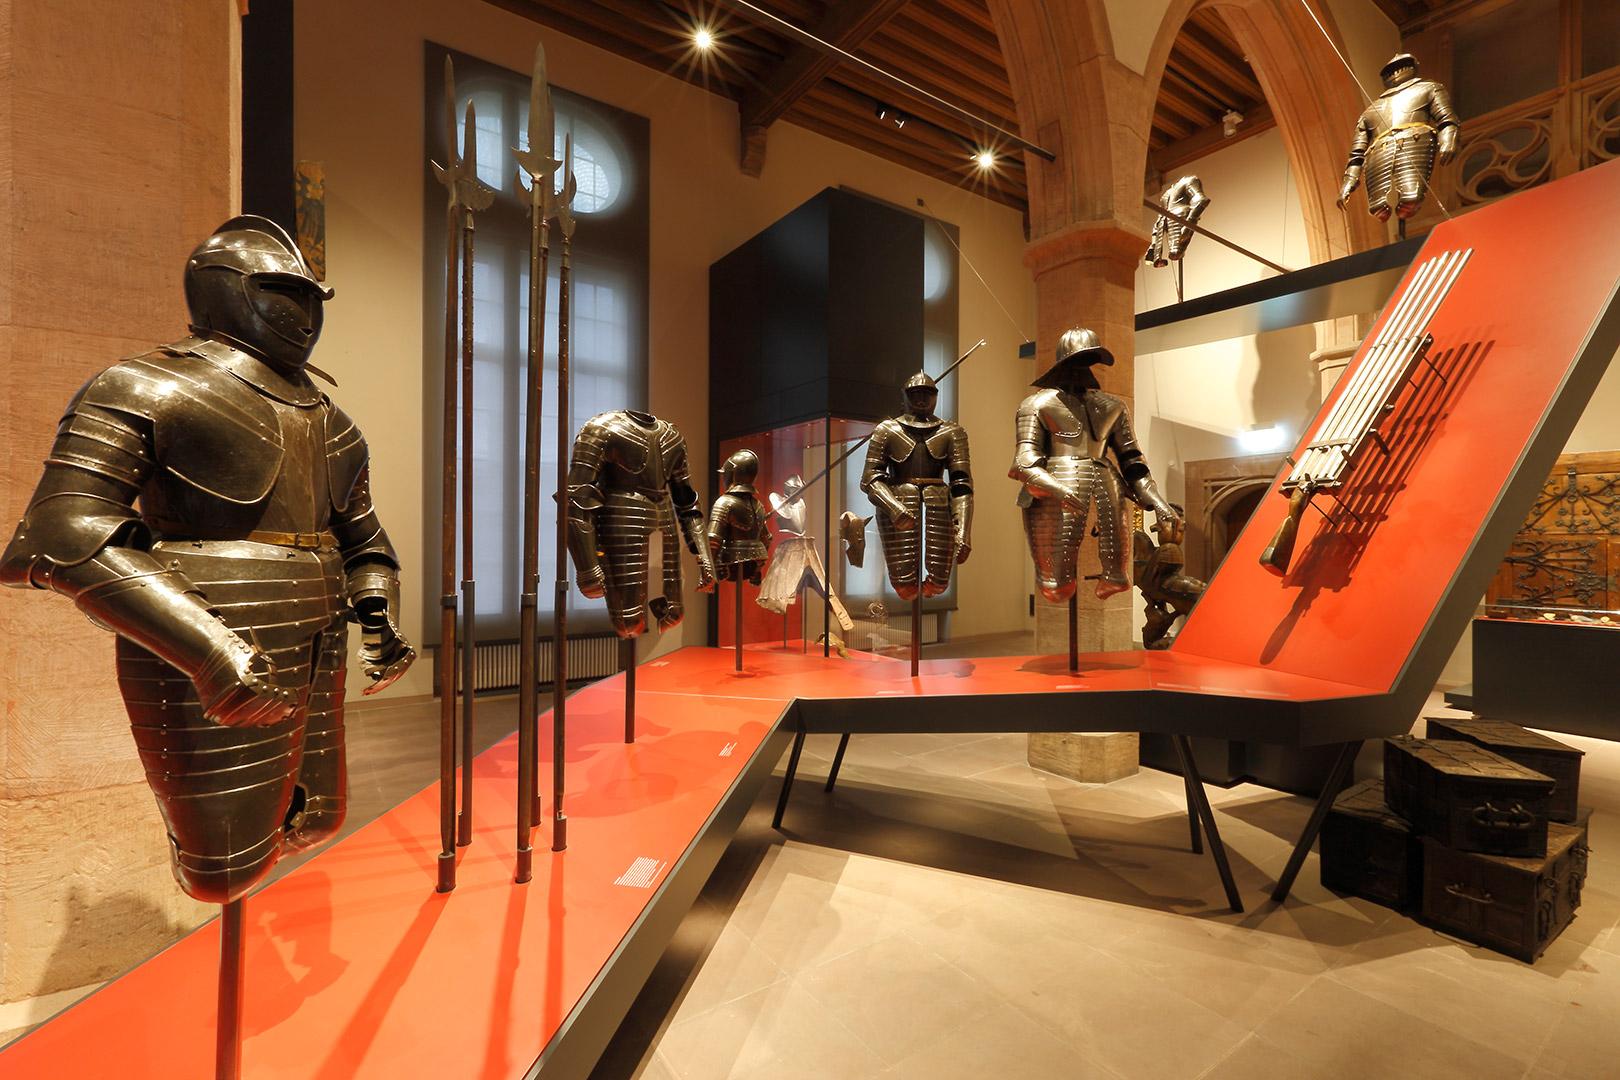 Hessisches Landesmuseum Kardorff Ingenieure Lichtplanung, Waffensaal